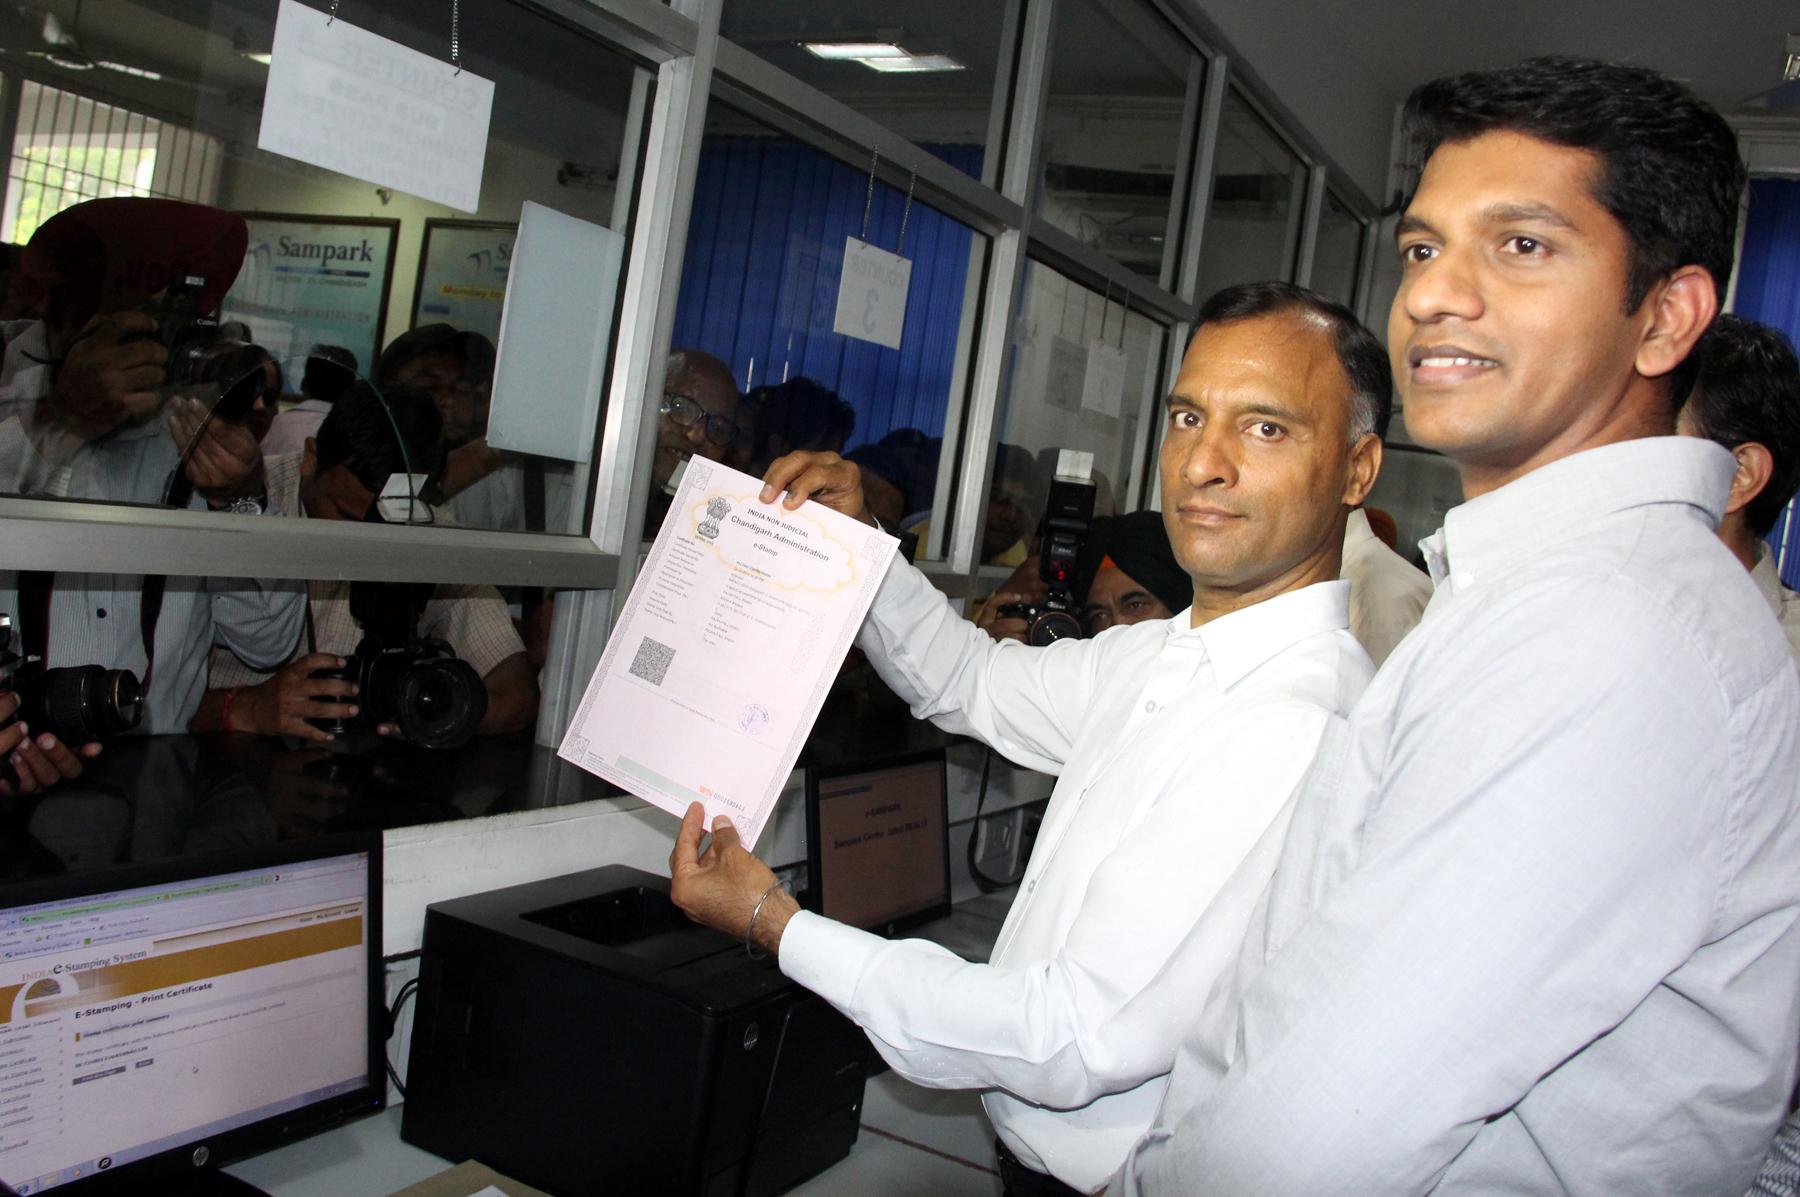 The Adviser to the Administrator, UT, Chandigarh, Mr. Vijay Dev launching e-stamping at Sampark Centre, Sector-21, Chandigarh on Thursday, July 02, 2015.  l